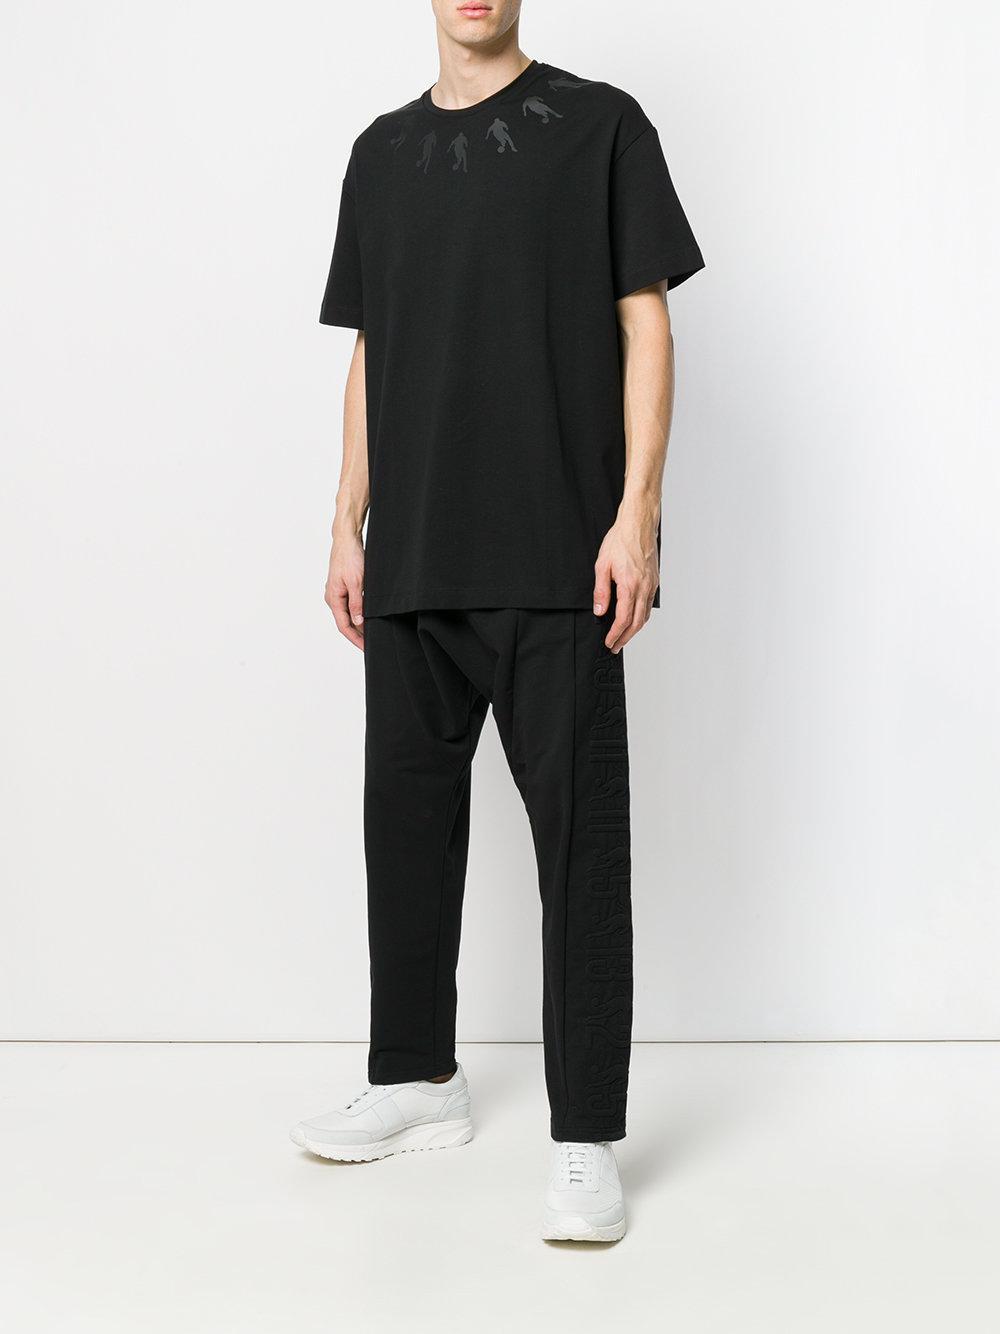 Discount Wiki printed neckline T-shirt - Black Dirk Bikkembergs Clearance Fake Cheap Sale Very Cheap AJD2GW